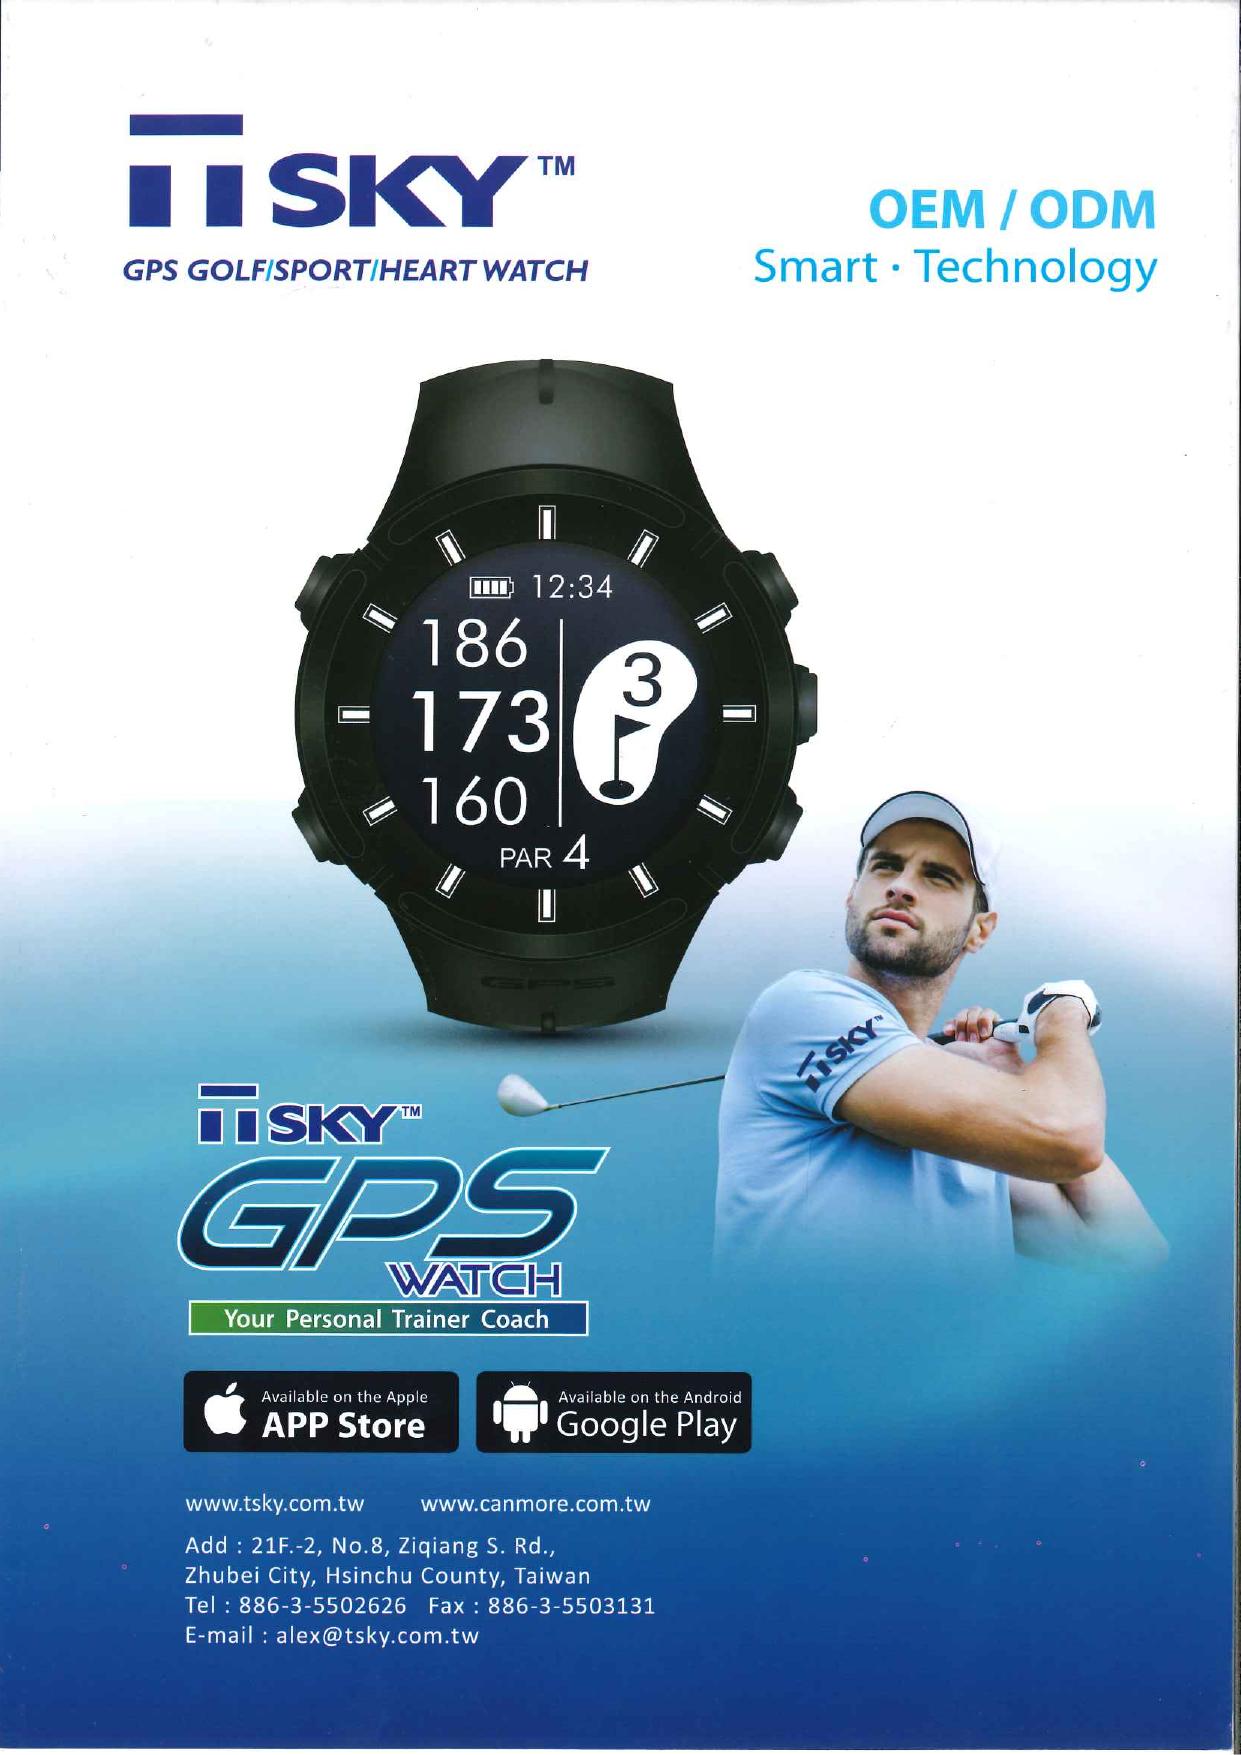 TSKY GPS WATCH